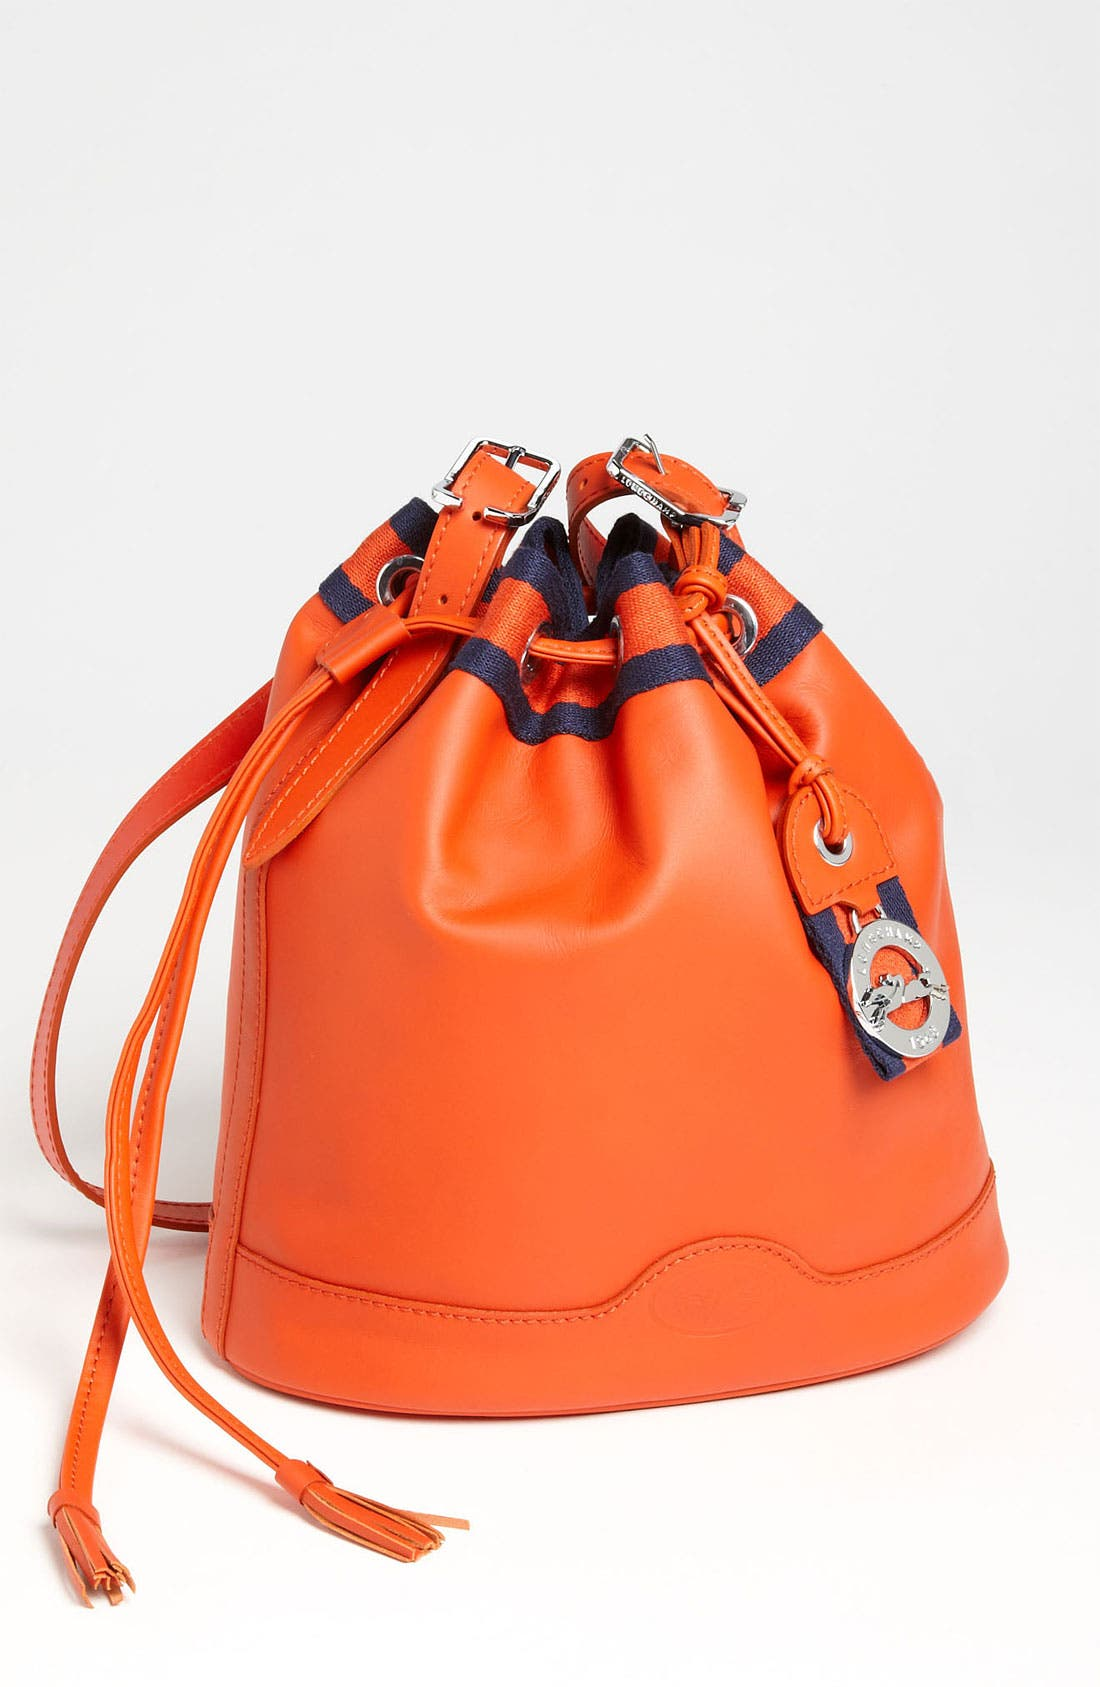 Main Image - Longchamp 'Au Sultan' Drawstring Bag